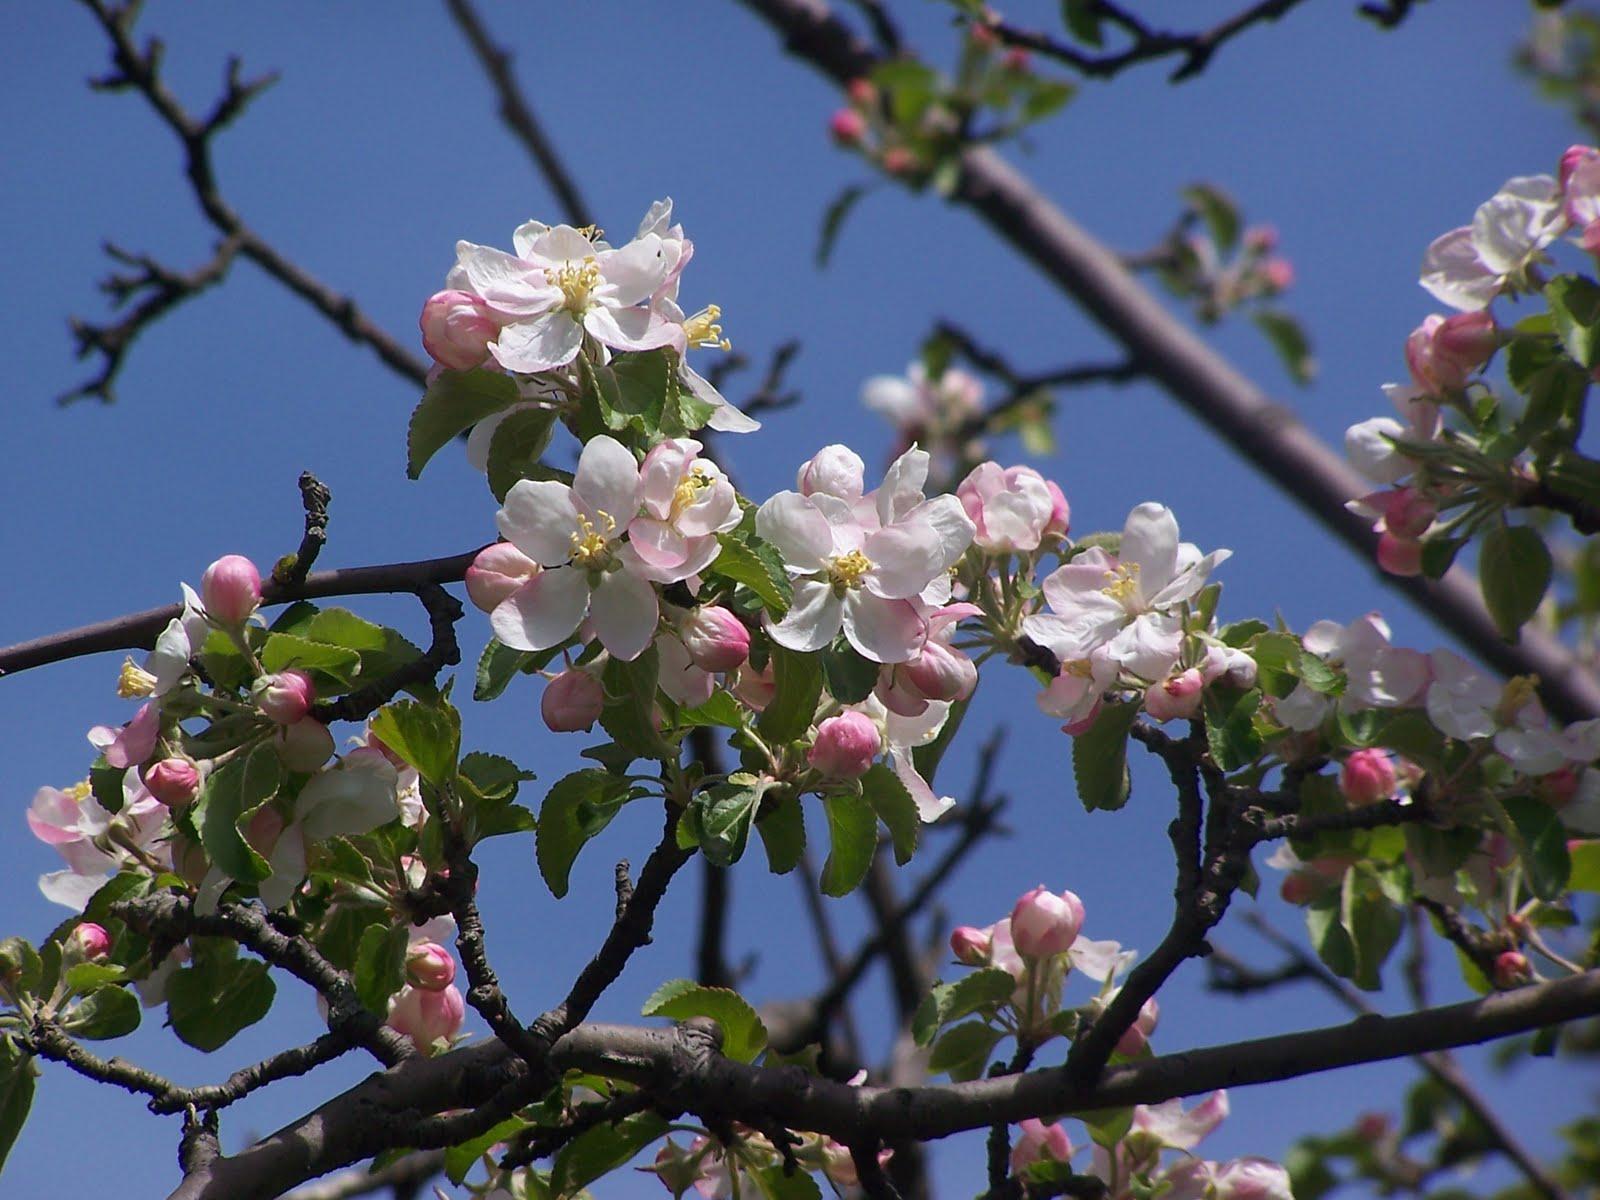 glory 39 s garden the last apple blossom. Black Bedroom Furniture Sets. Home Design Ideas